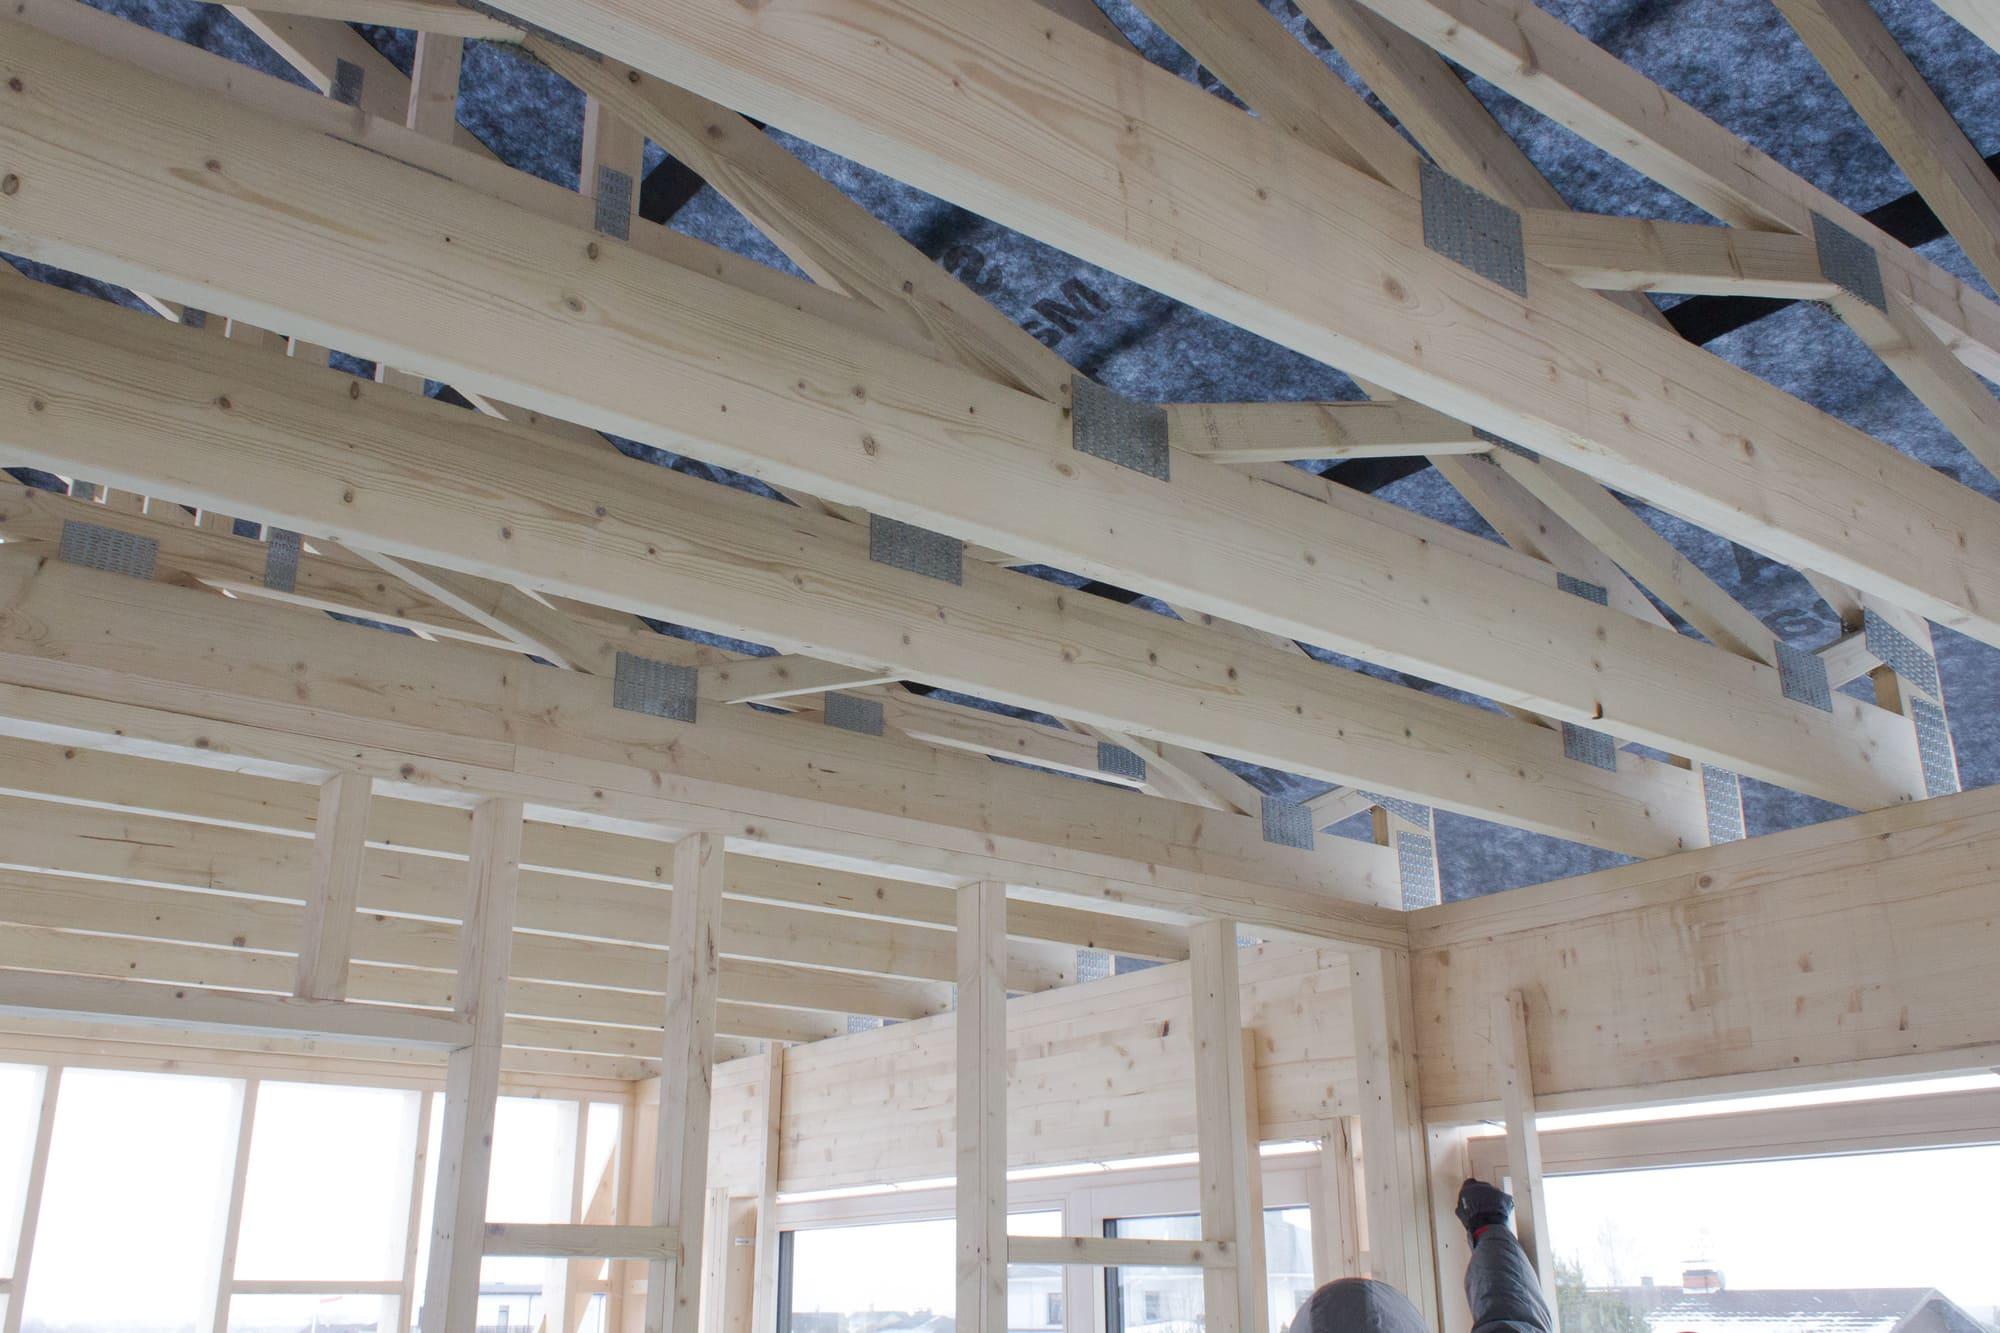 stogo membrana ant medinių santvarų